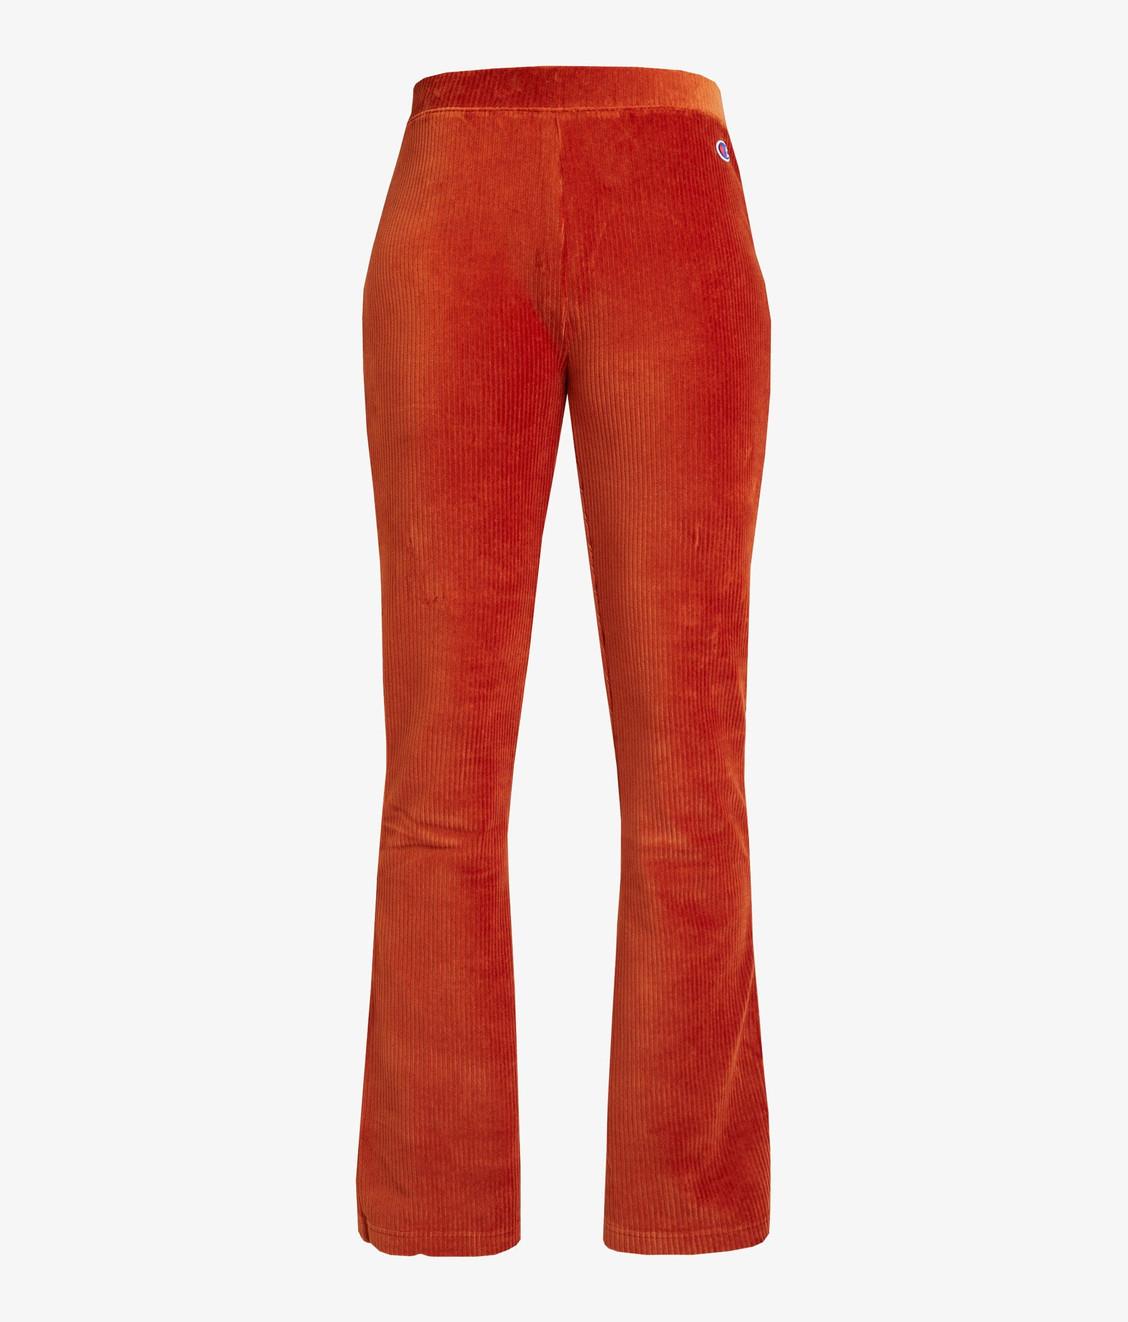 Champion Champion Corduroy Pants Orange